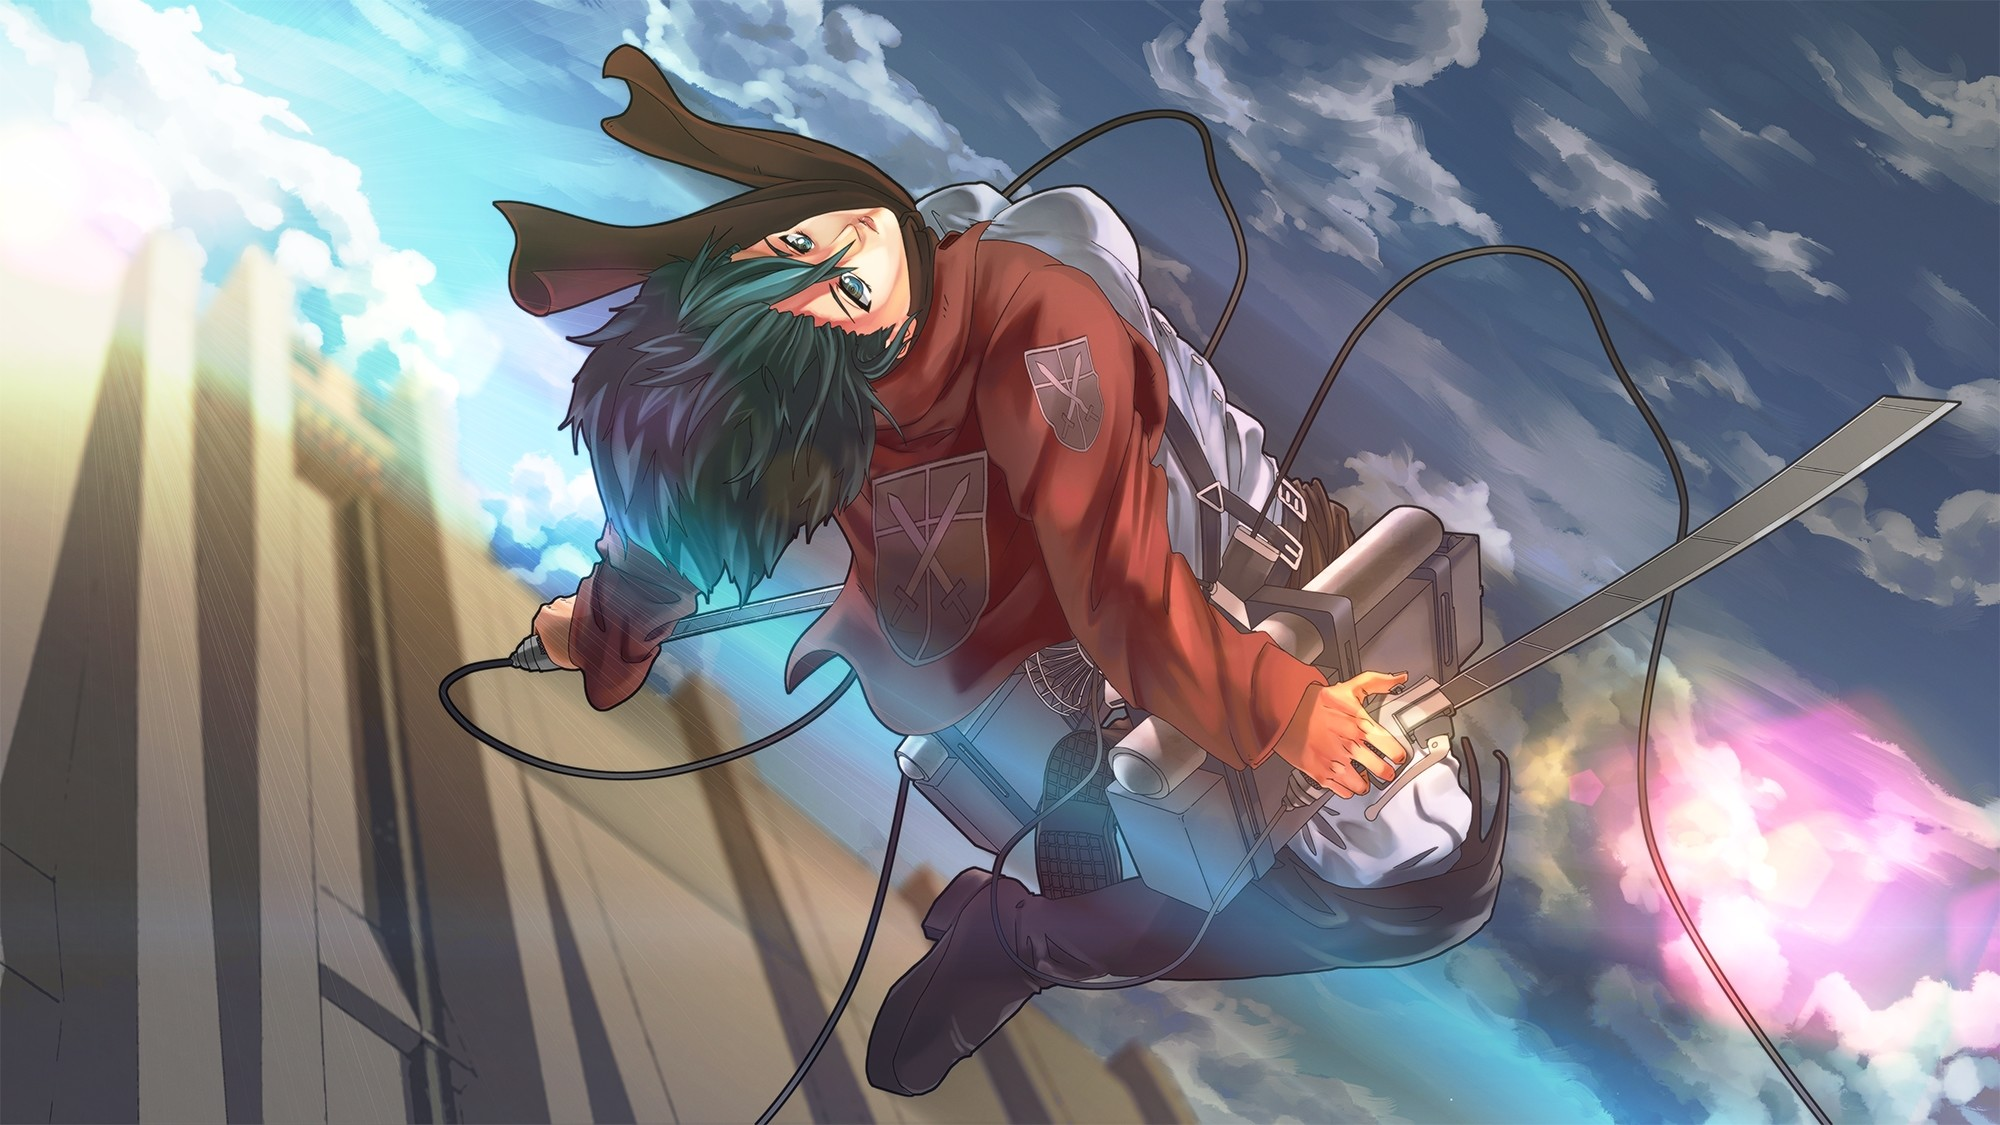 Attack on titan mikasa ackerman wallpapers 82 images - Eren and mikasa wallpaper ...